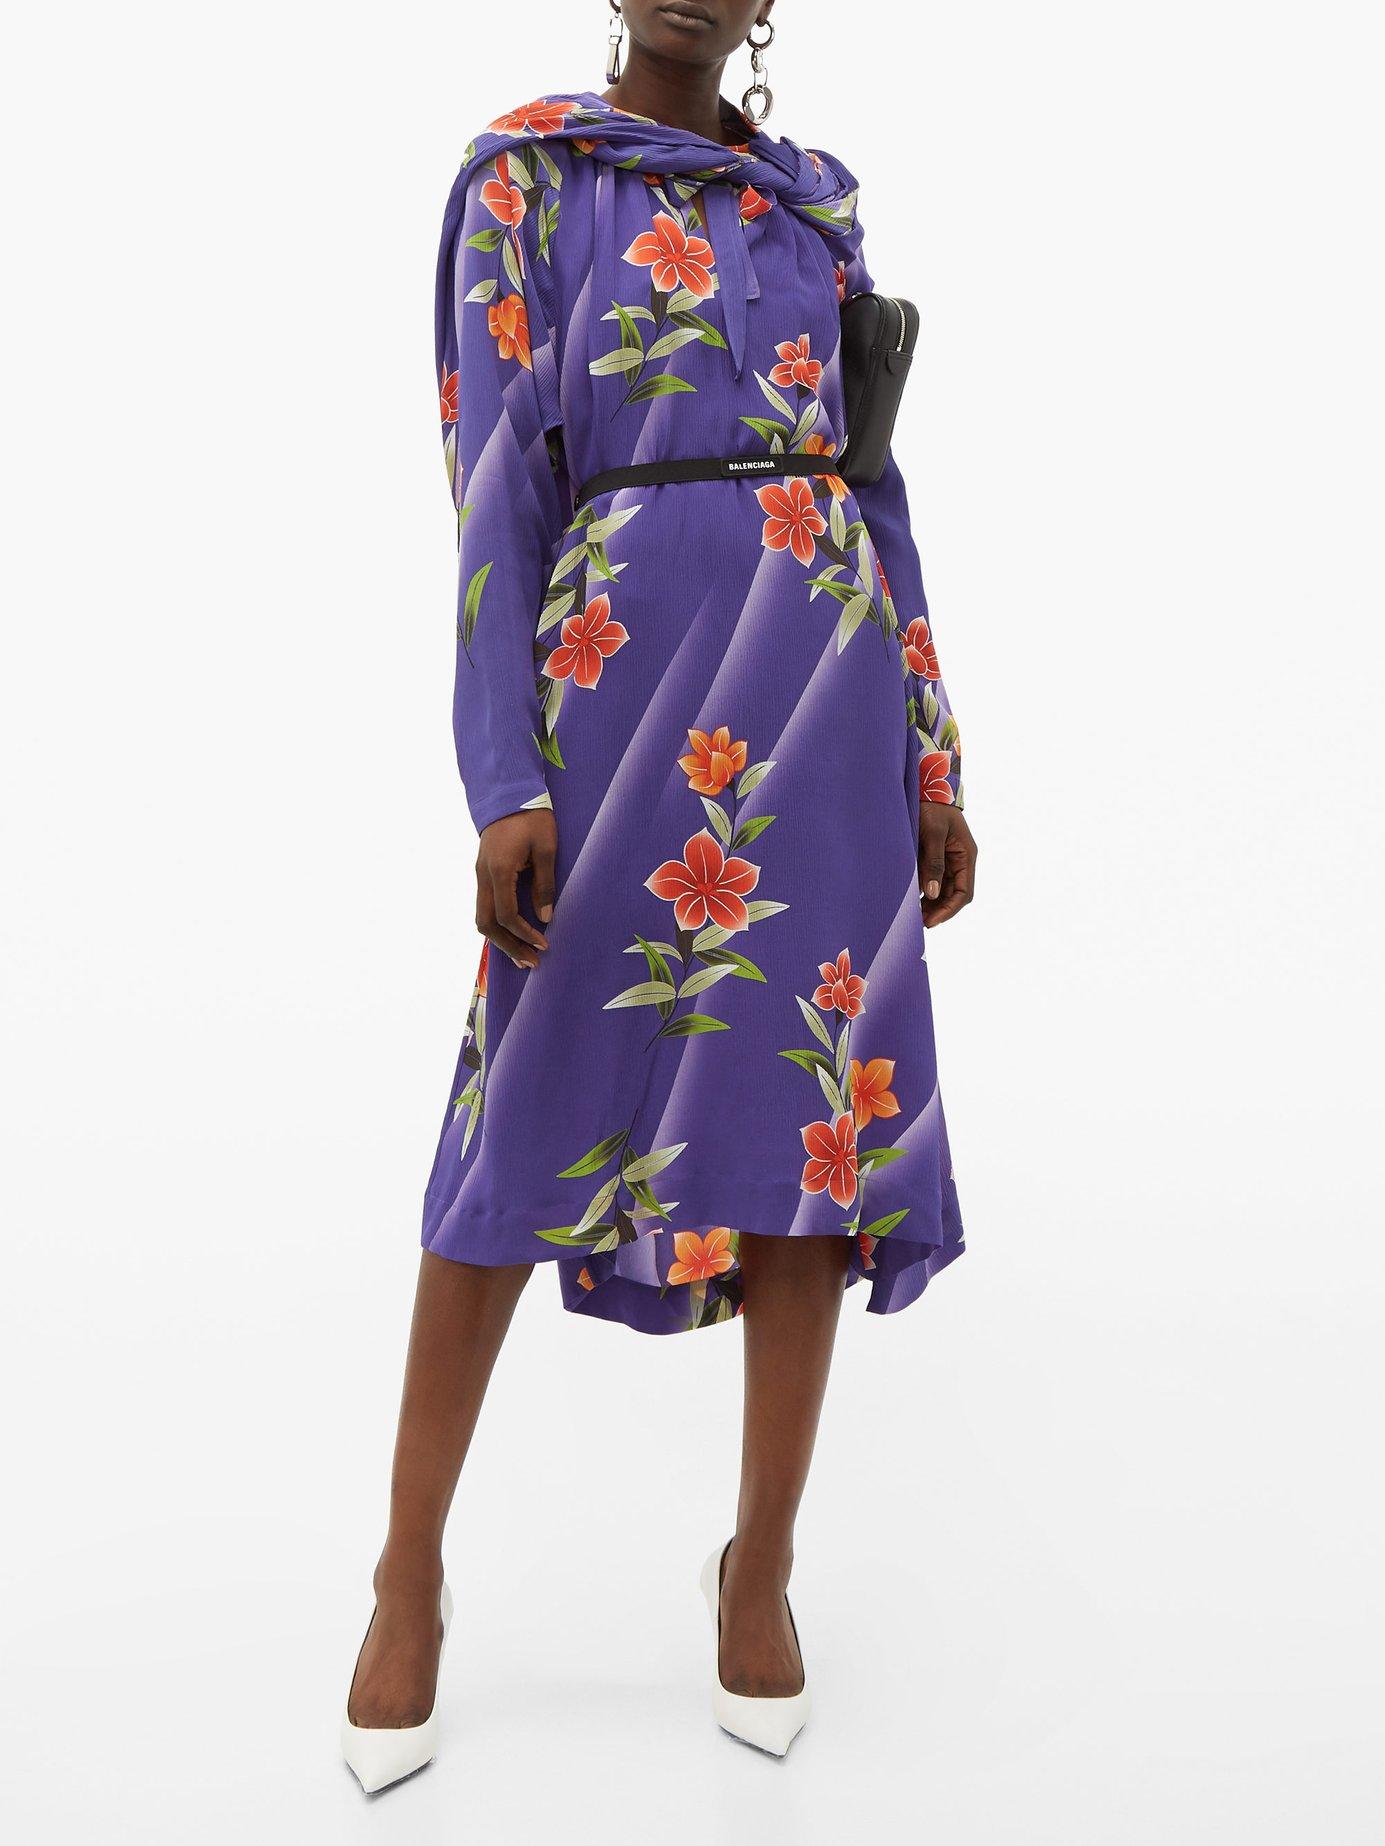 Floral-print twisted silk dress by Balenciaga